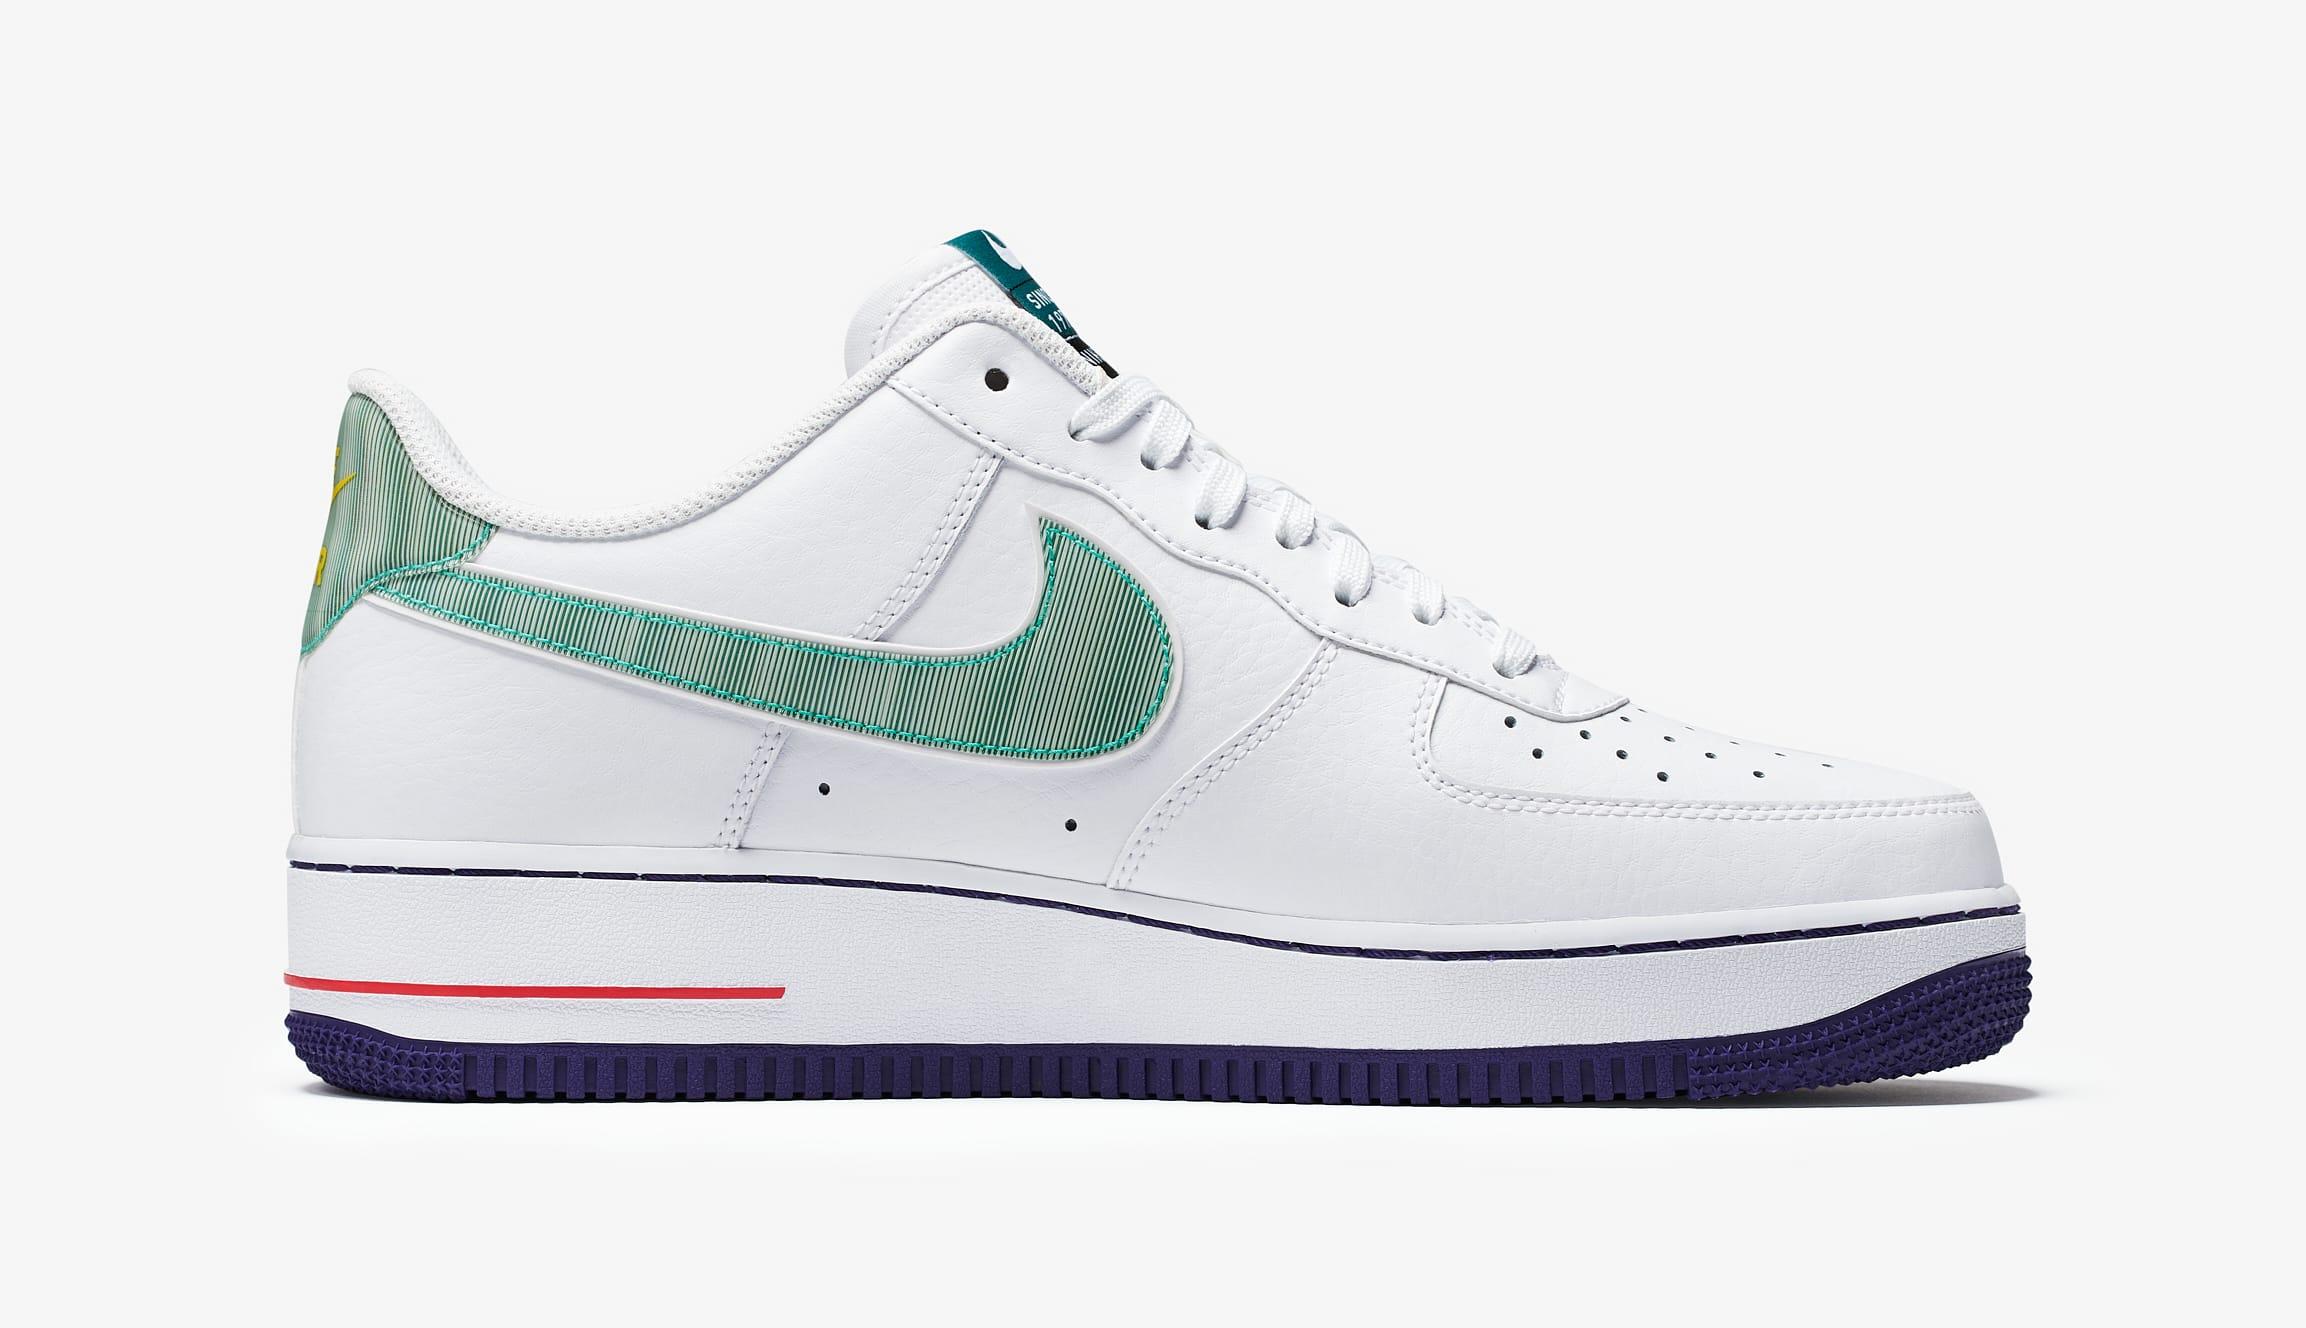 Nike Air Force 1 Low 'Pregame' Medial